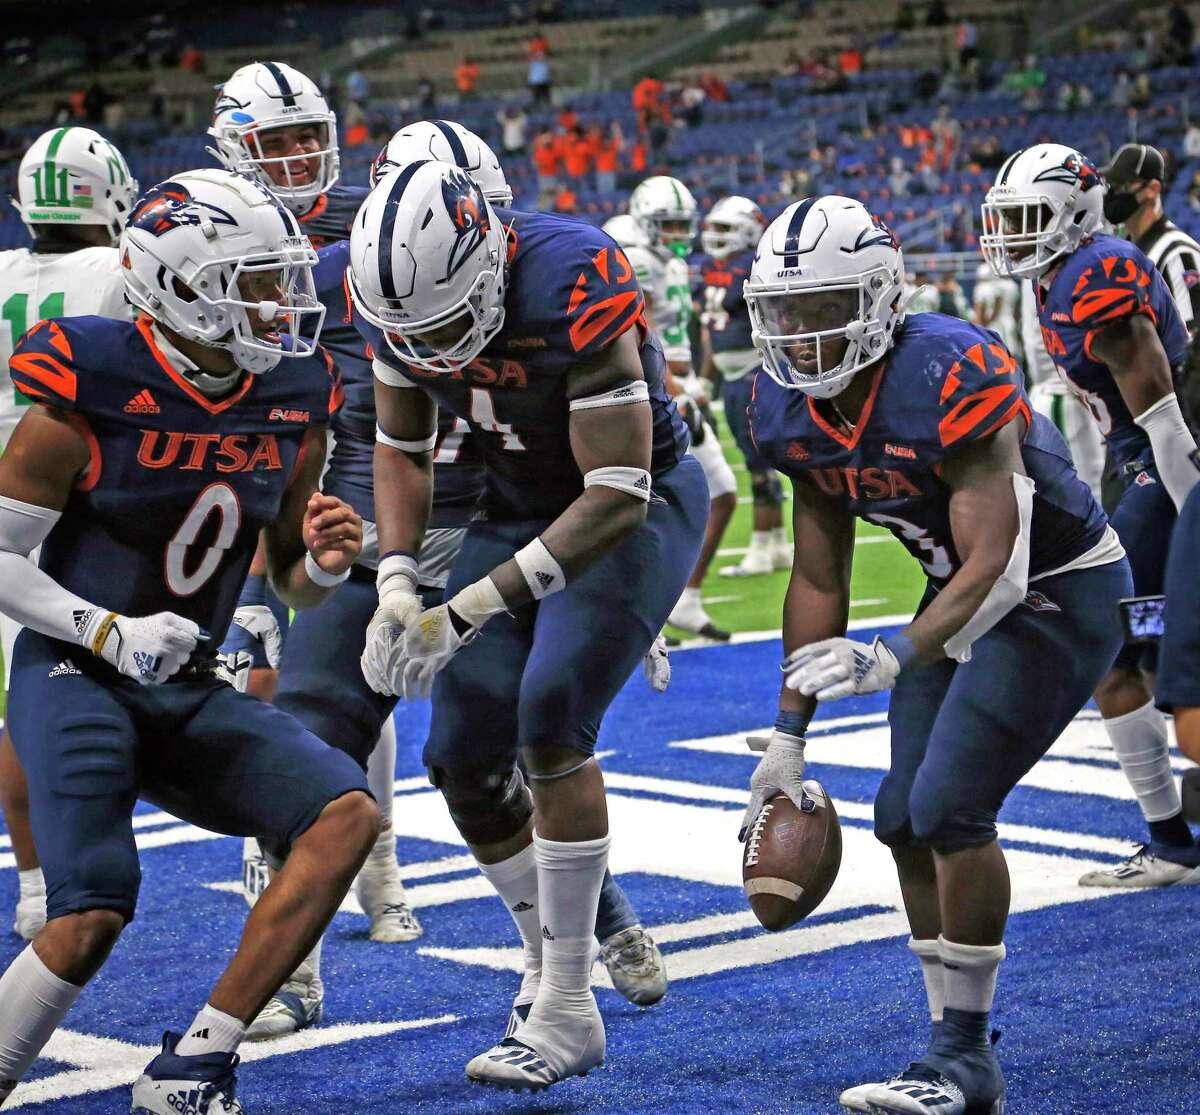 UTSA RB Sincere McCormick,R, celebrates with teammates after his fourth quarter touchdown. UTSA vs. North Texas at the Alamodome on Saturday, Nov. 28. 2020. UTSA 49 North Texas 17